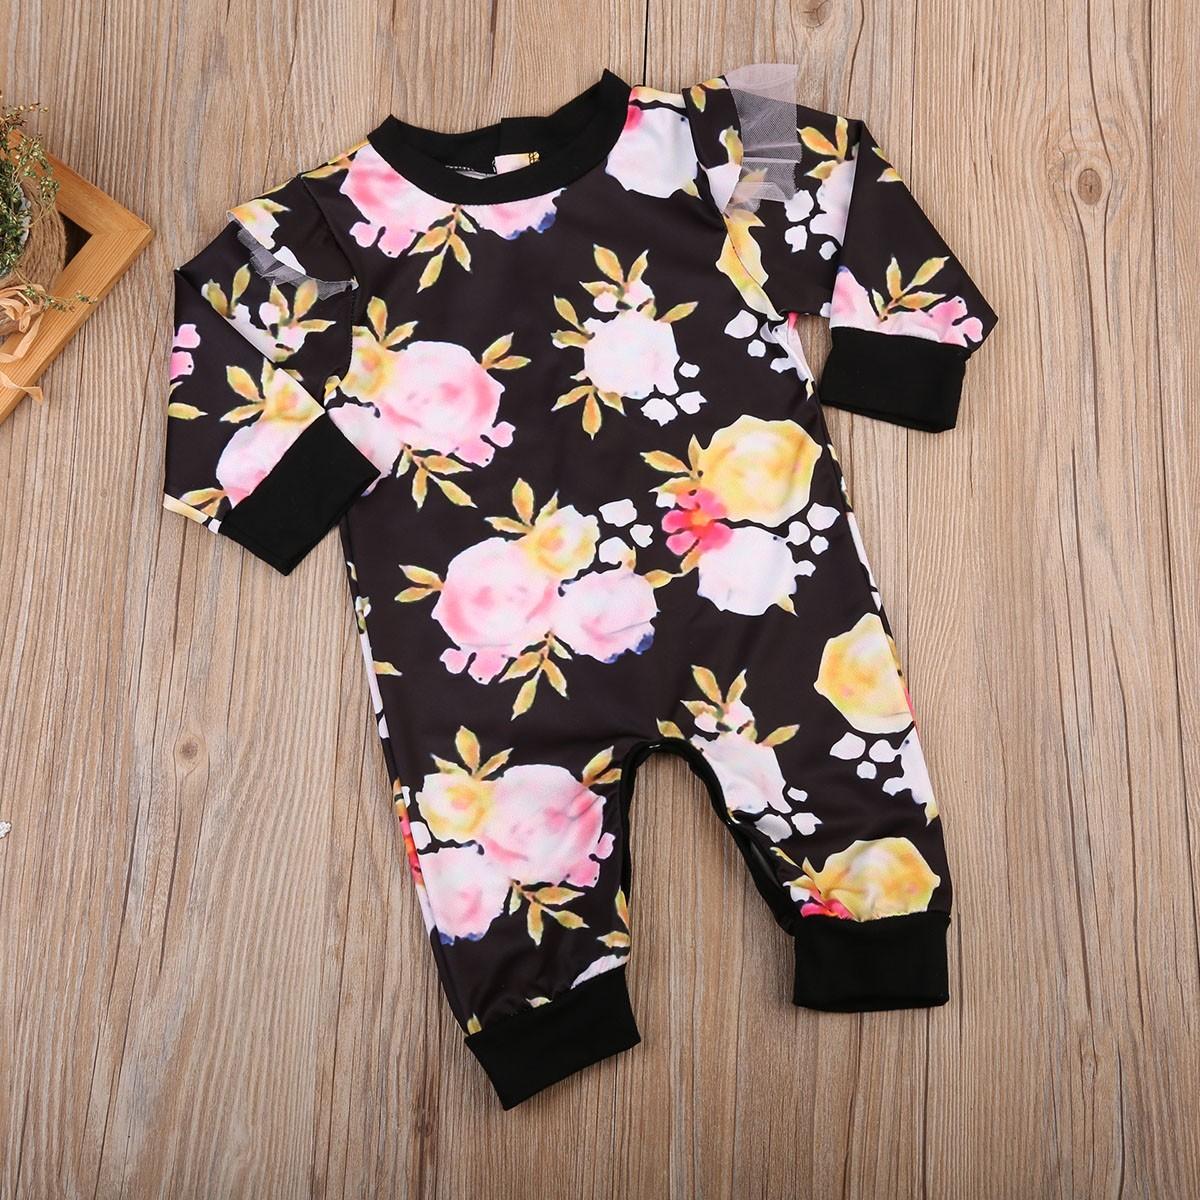 5f0d9e81445e Mareya Trade - USA Kids Baby Girl Boy Floral Romper Jumpsuit Pants ...